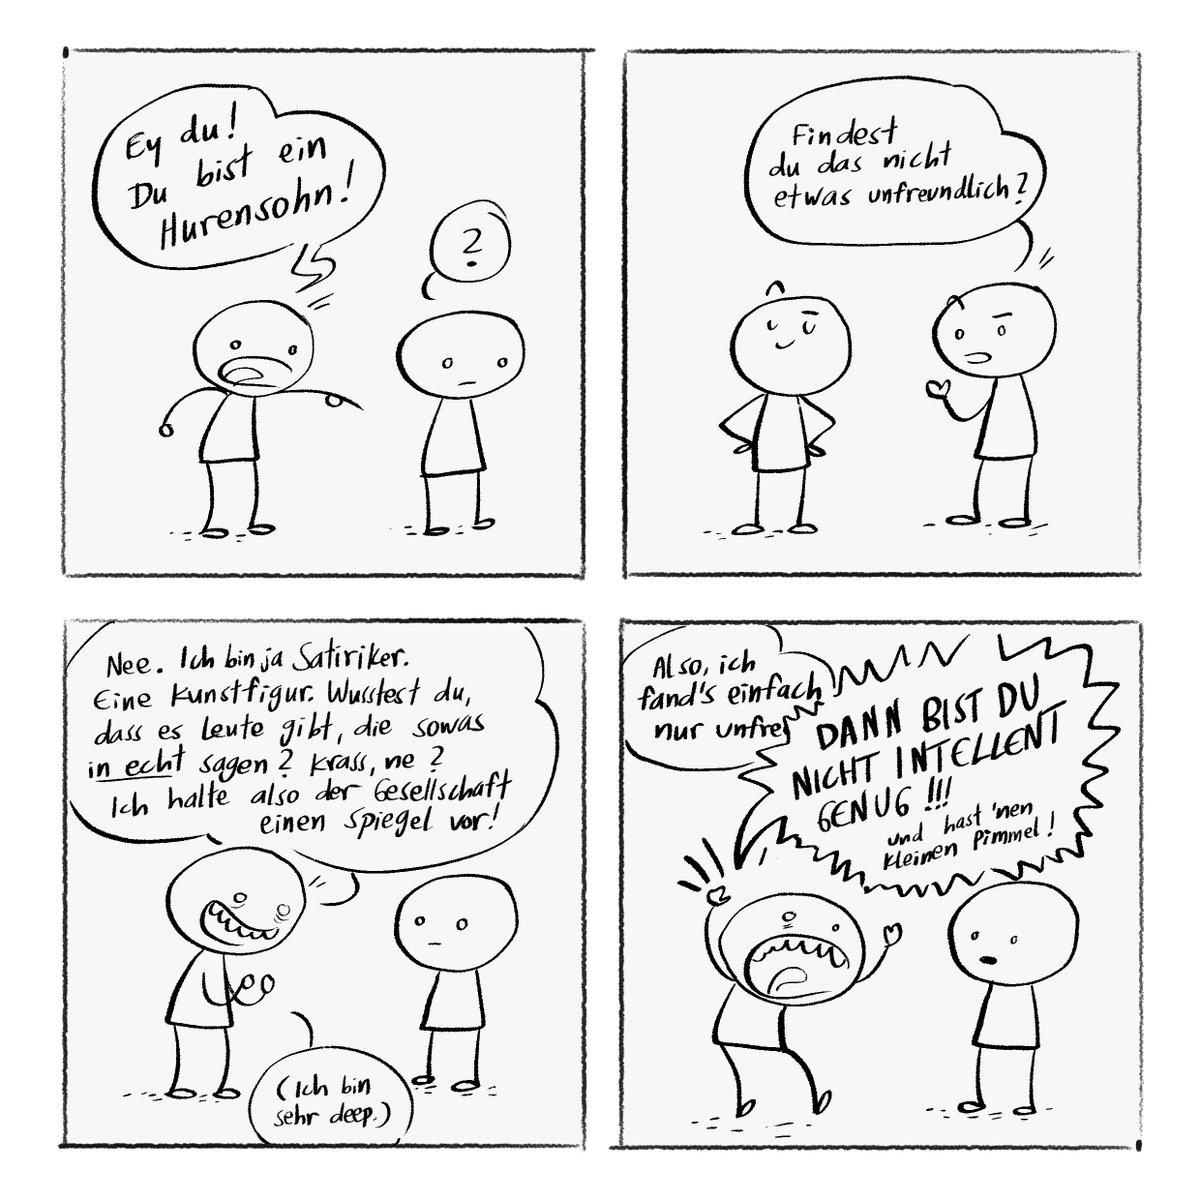 RT @JoLottIllu: Deutsche Satire 2020. Aus aktuellem Anlass. #Somuncu #Cancelculture #Satire https://t.co/URxVxDa19s